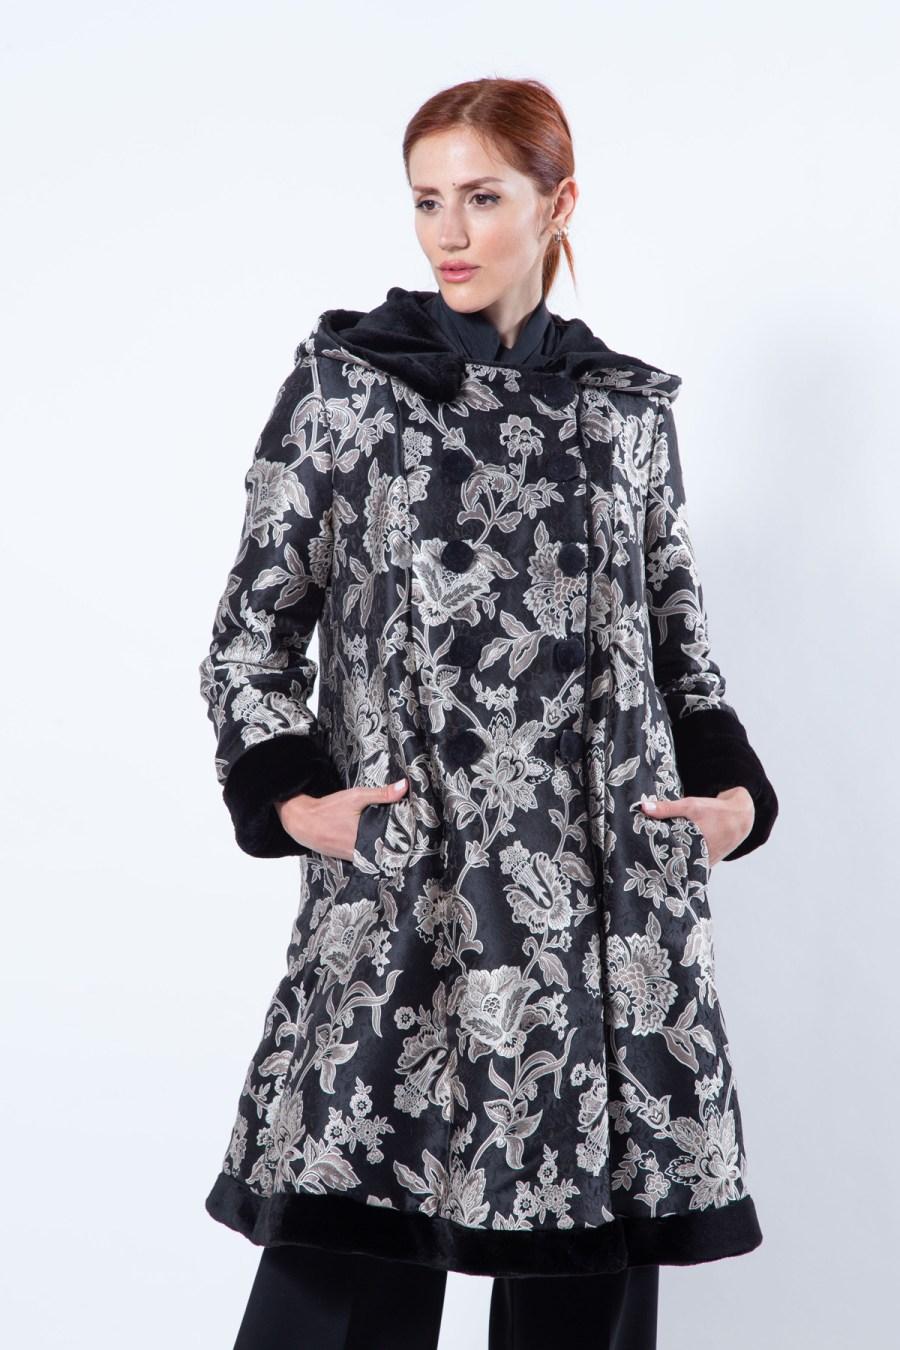 Double-faced Black Sheared Mink and Fabric Coat | Двусторонняя Шуба с капюшоном из чёрной стриженной норки - Sarigianni Furs